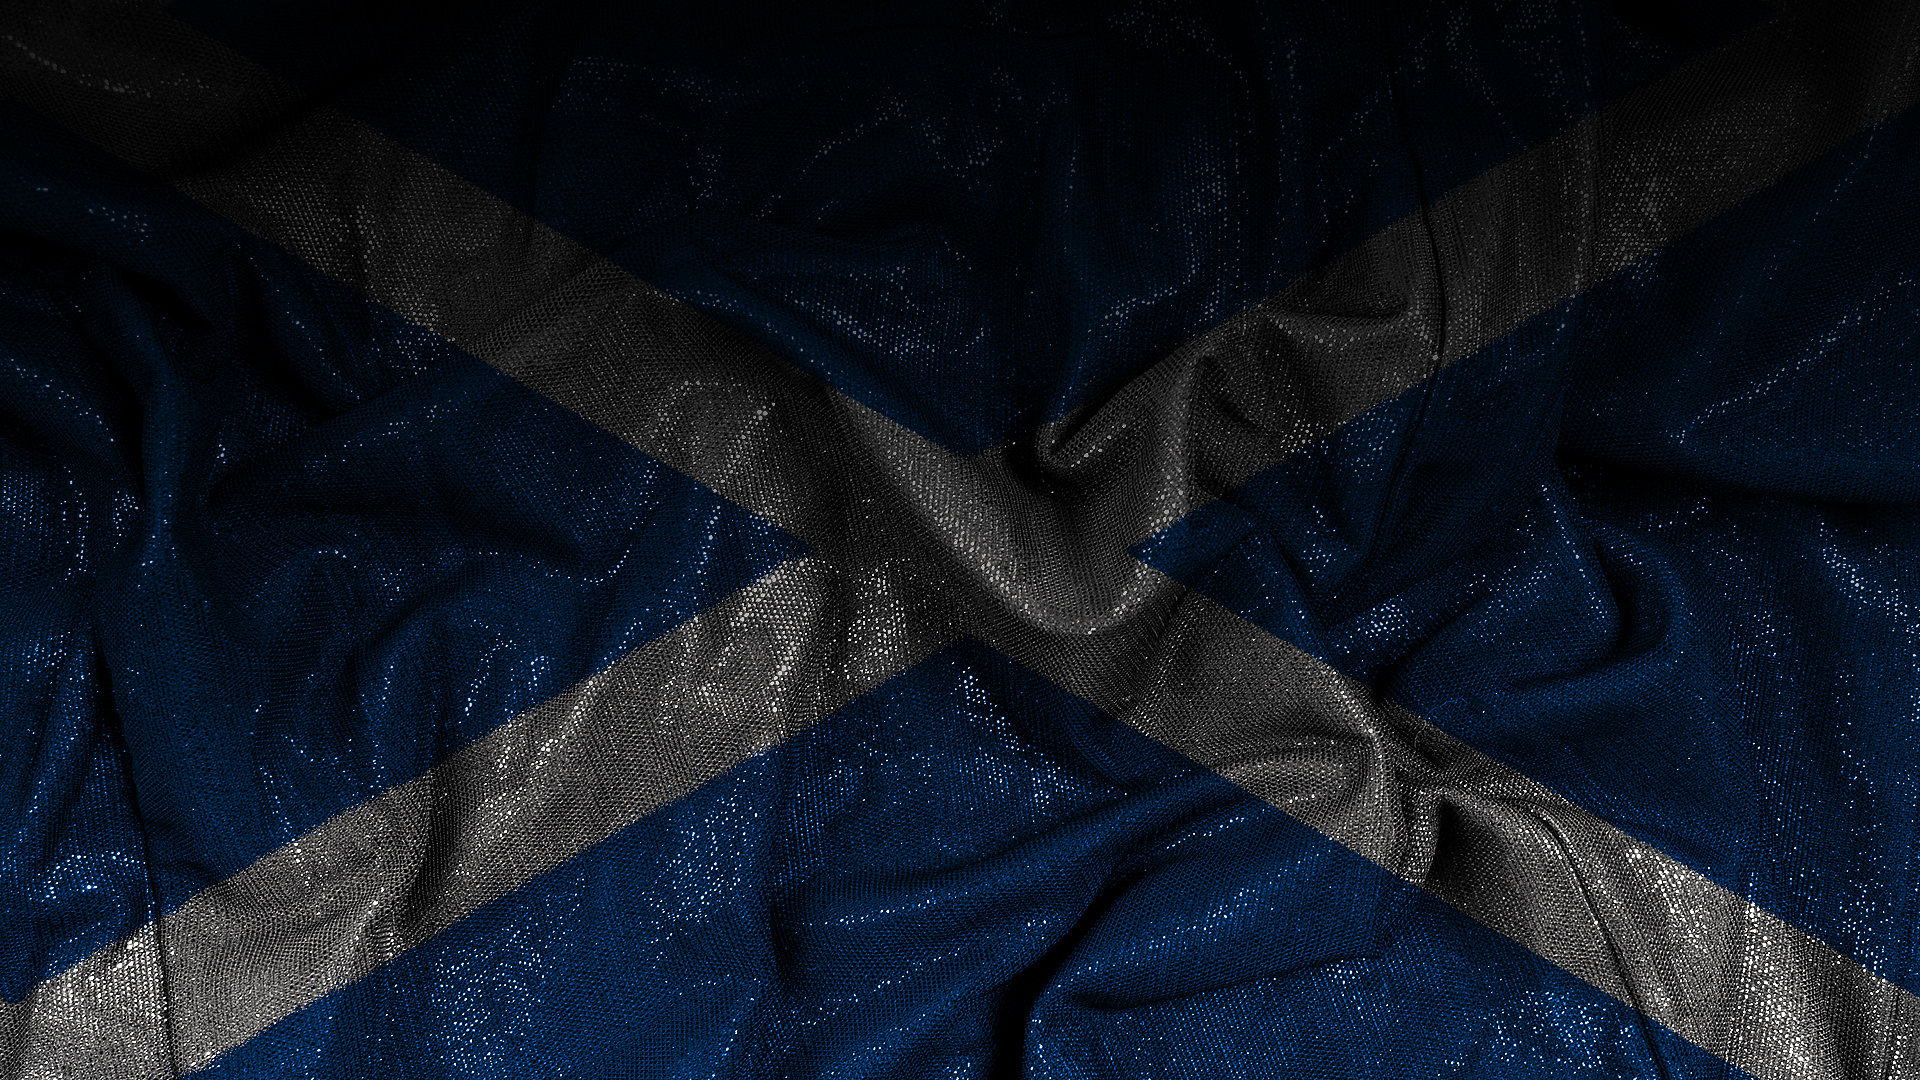 hd scotland flag wallpaper - photo #24